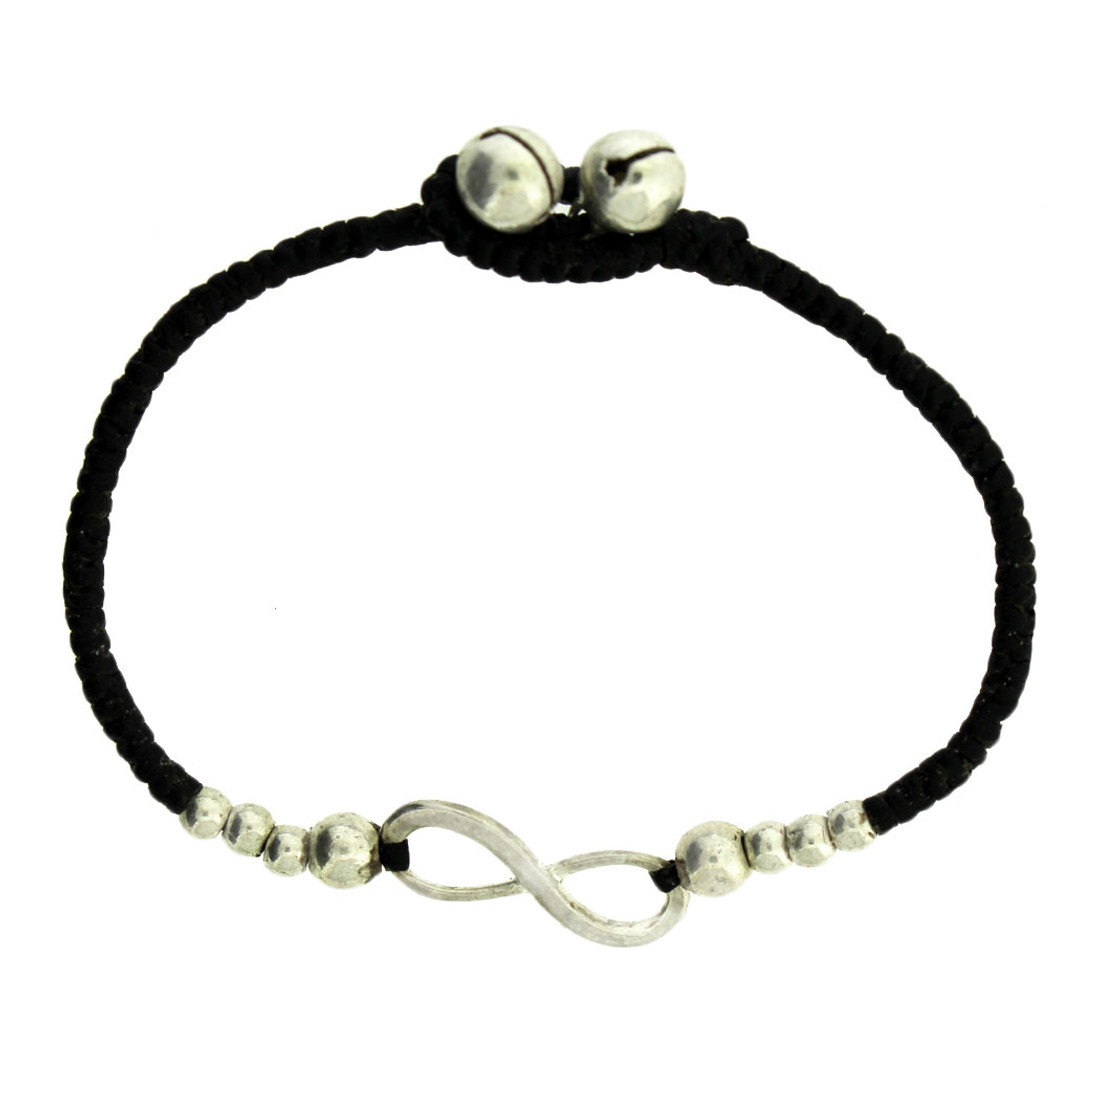 Infinity Design Silver Alloy Bracelet Wrist Jewelry Waxed Linen Wristband